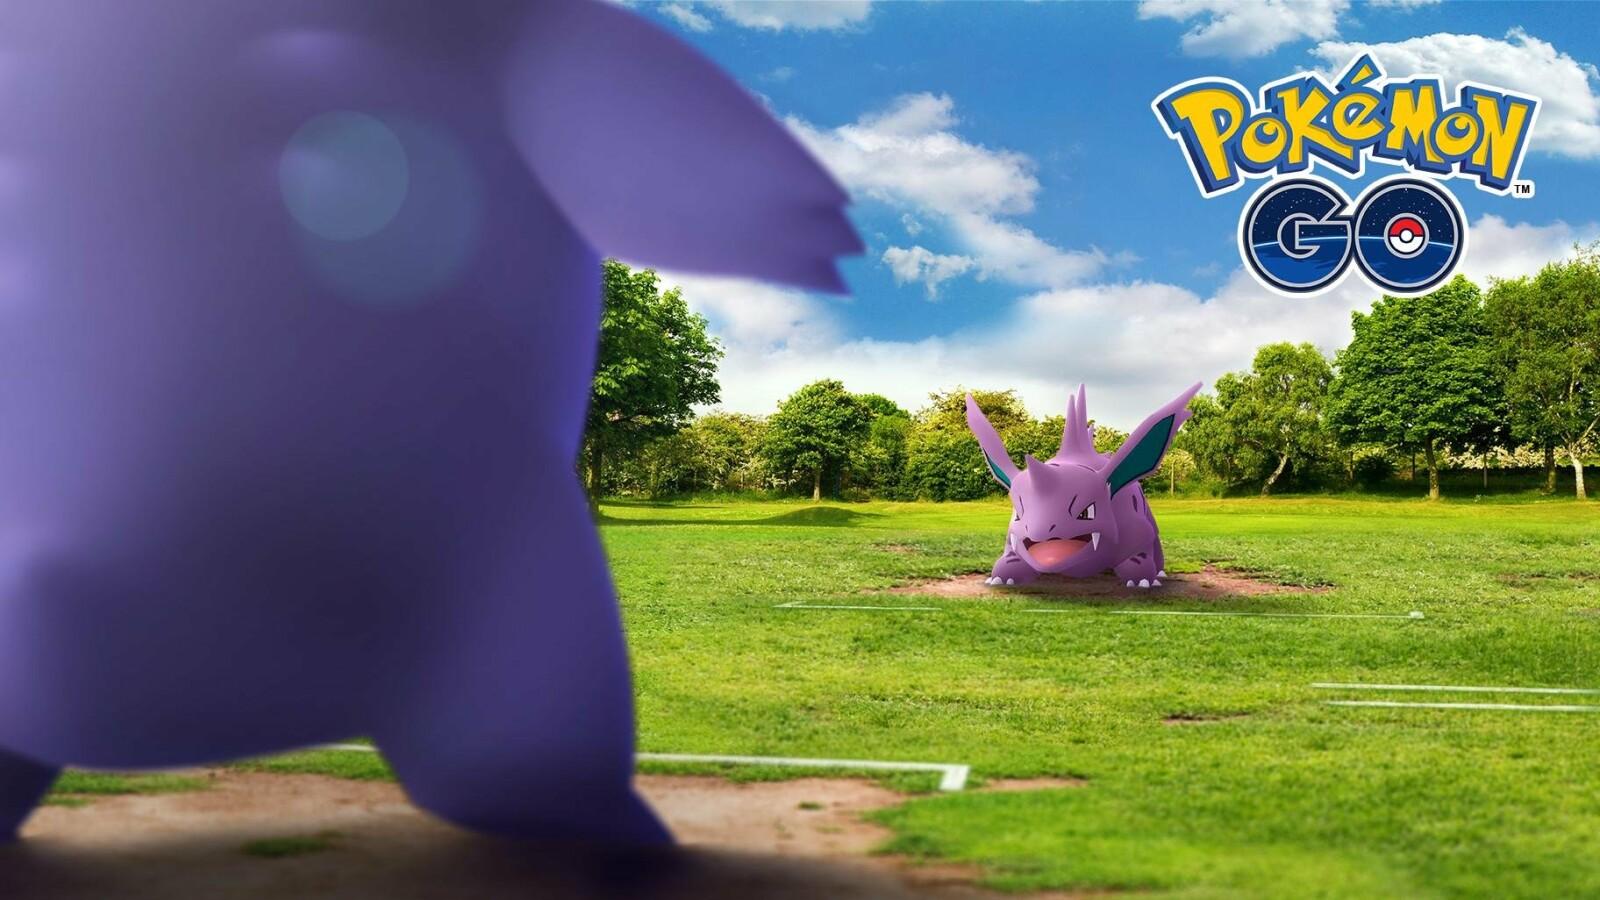 Pokemon go trainer kämpfe